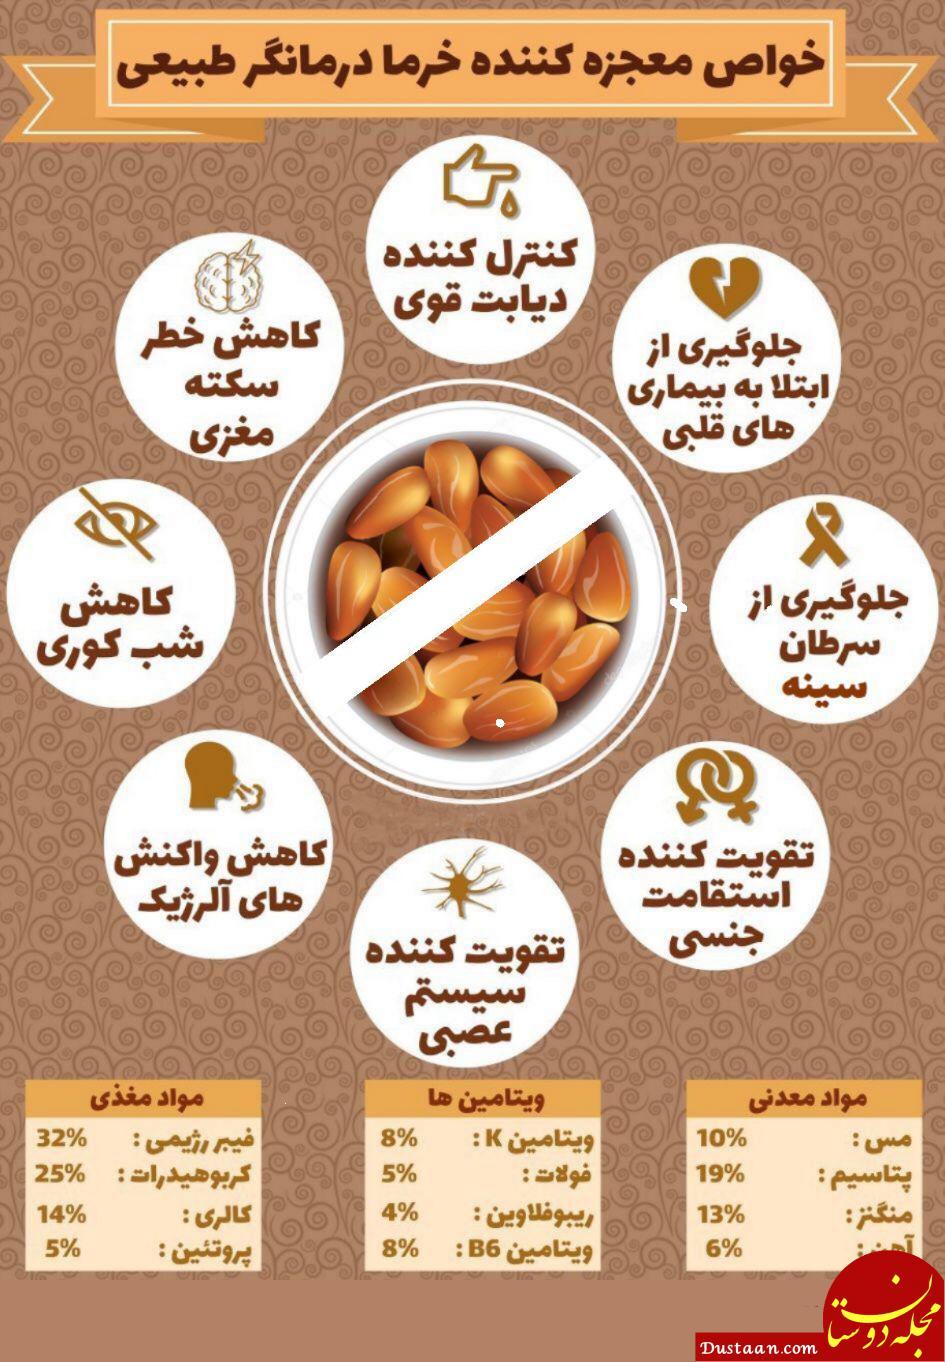 www.dustaan.com خواص خرما / صبح ها خرما بخورید!